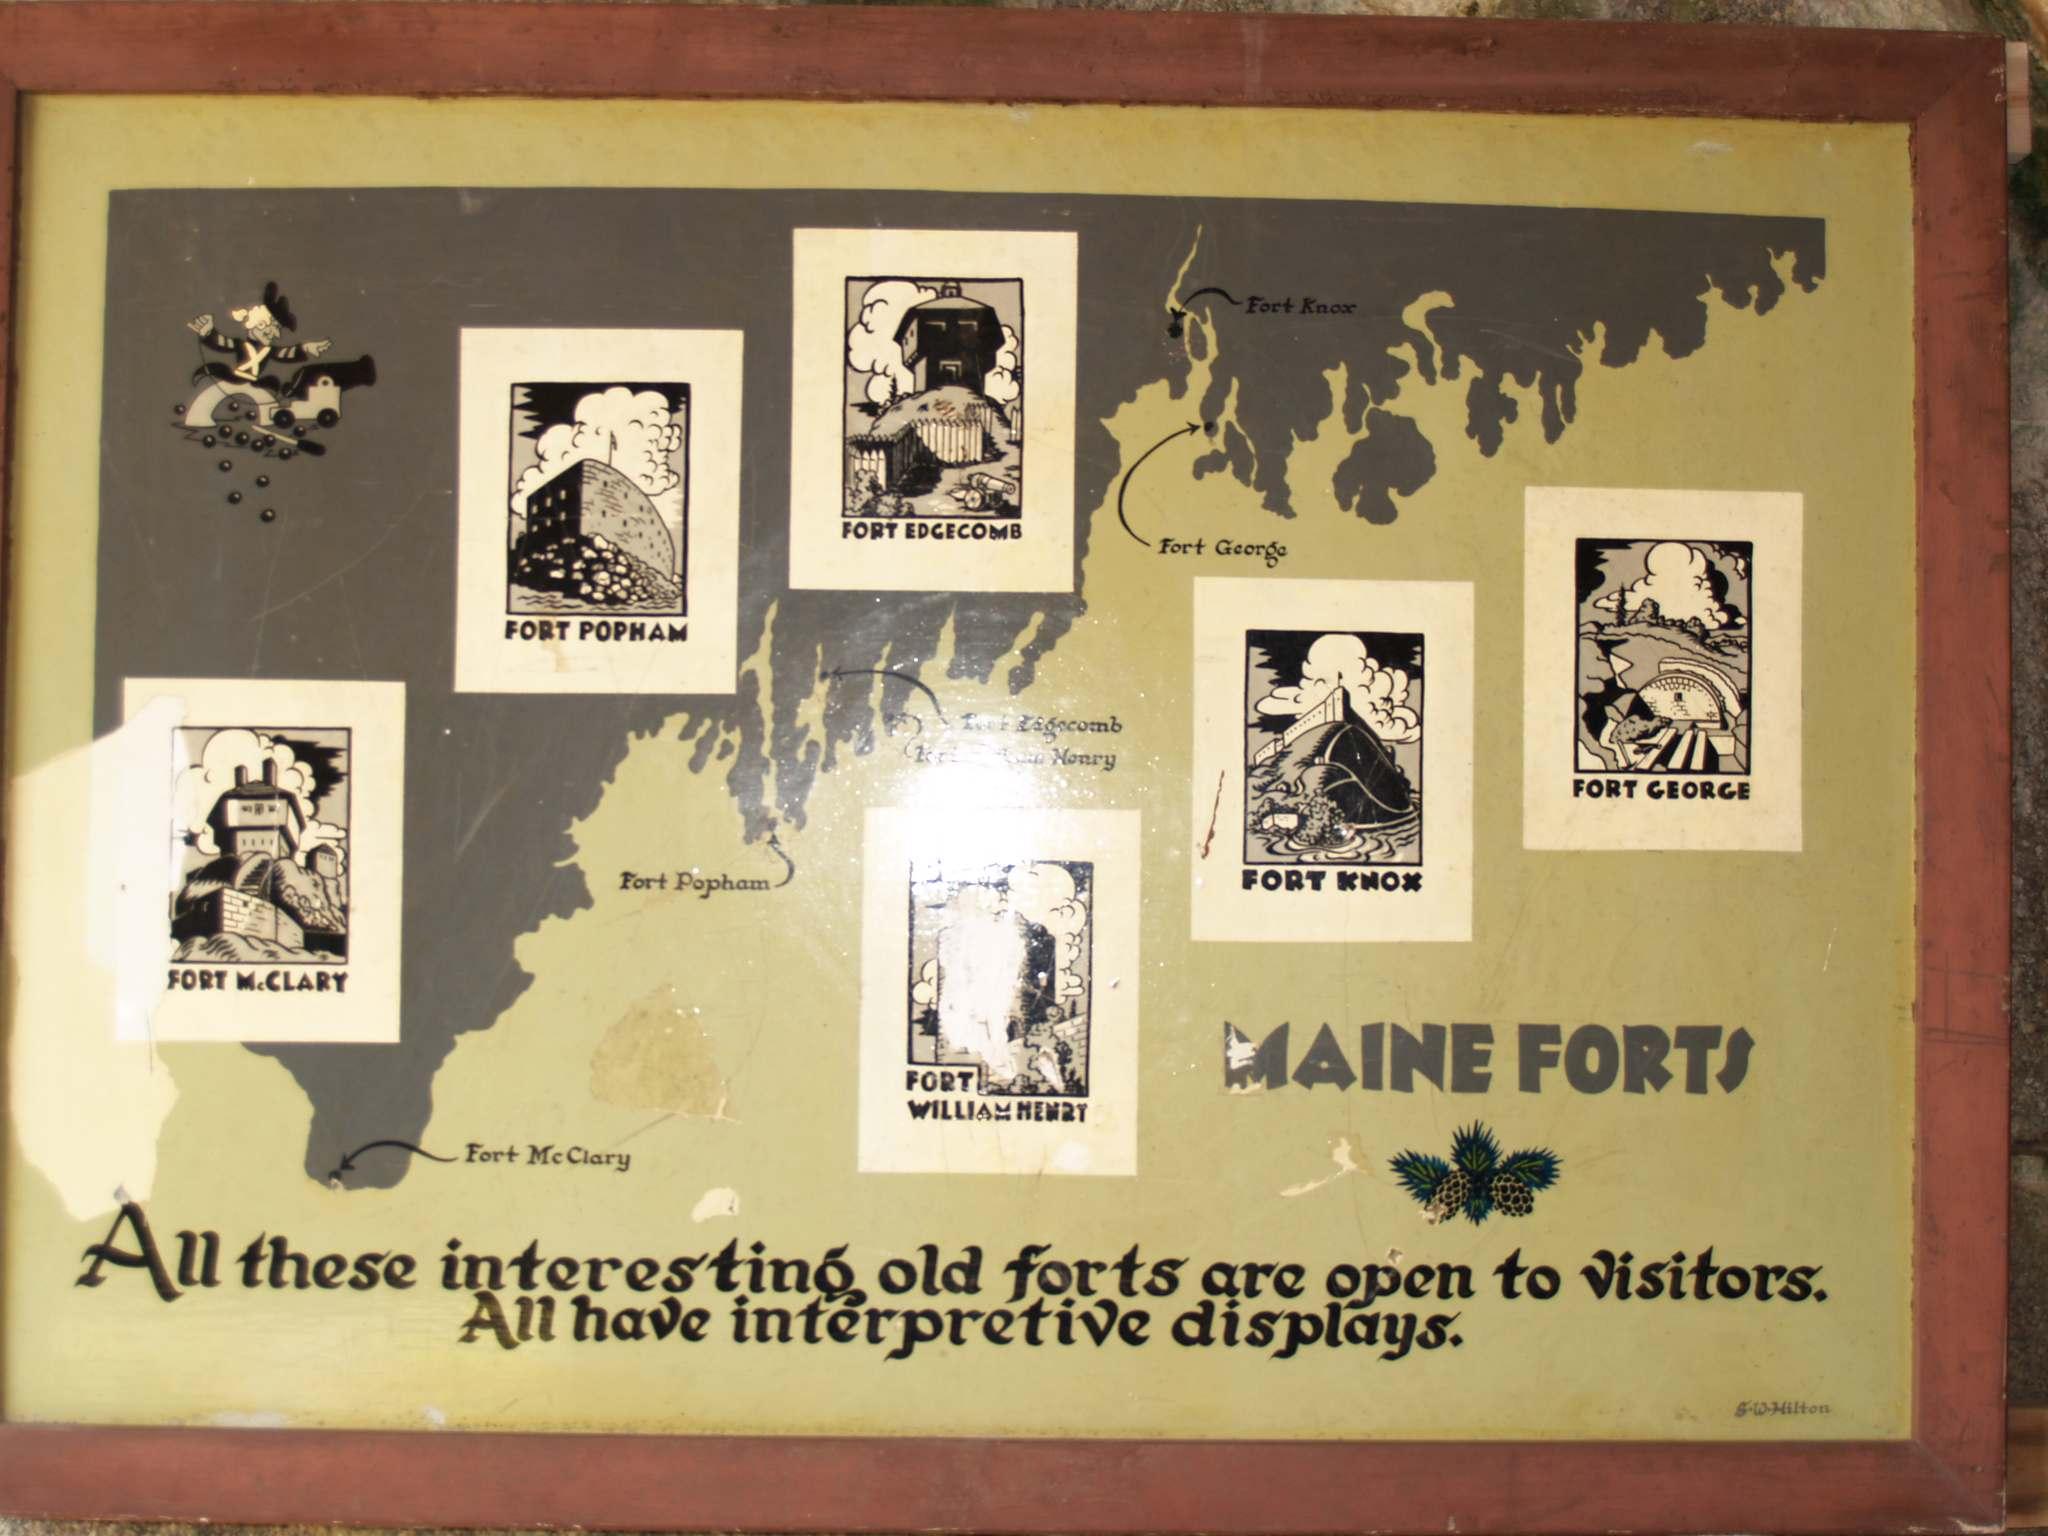 fort popham10 Majestic Fort Popham, Maine